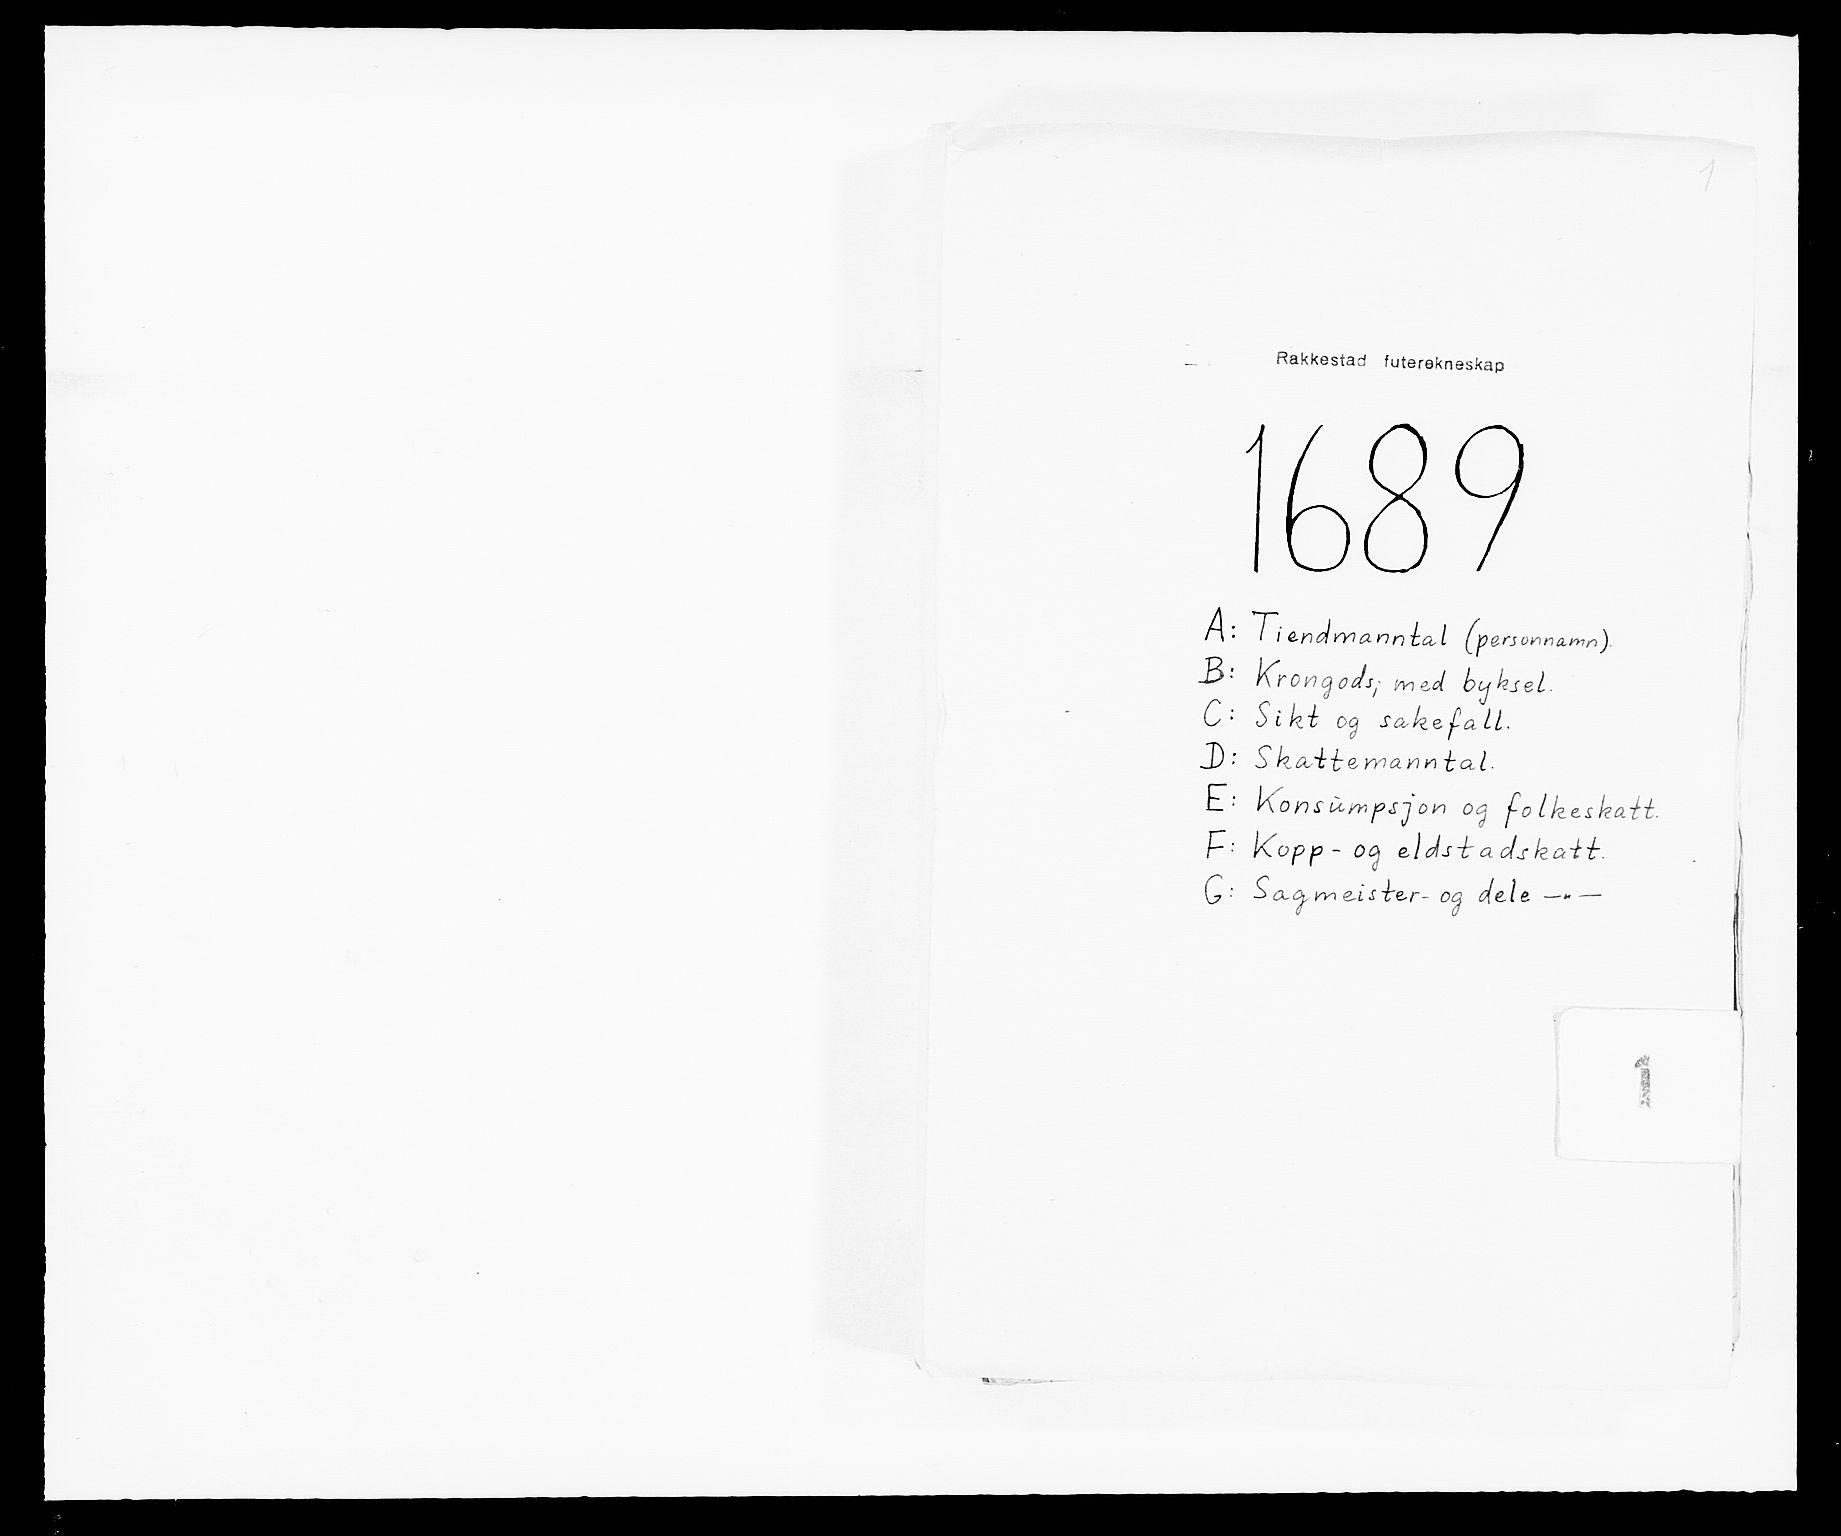 RA, Rentekammeret inntil 1814, Reviderte regnskaper, Fogderegnskap, R05/L0277: Fogderegnskap Rakkestad, 1689-1690, s. 1